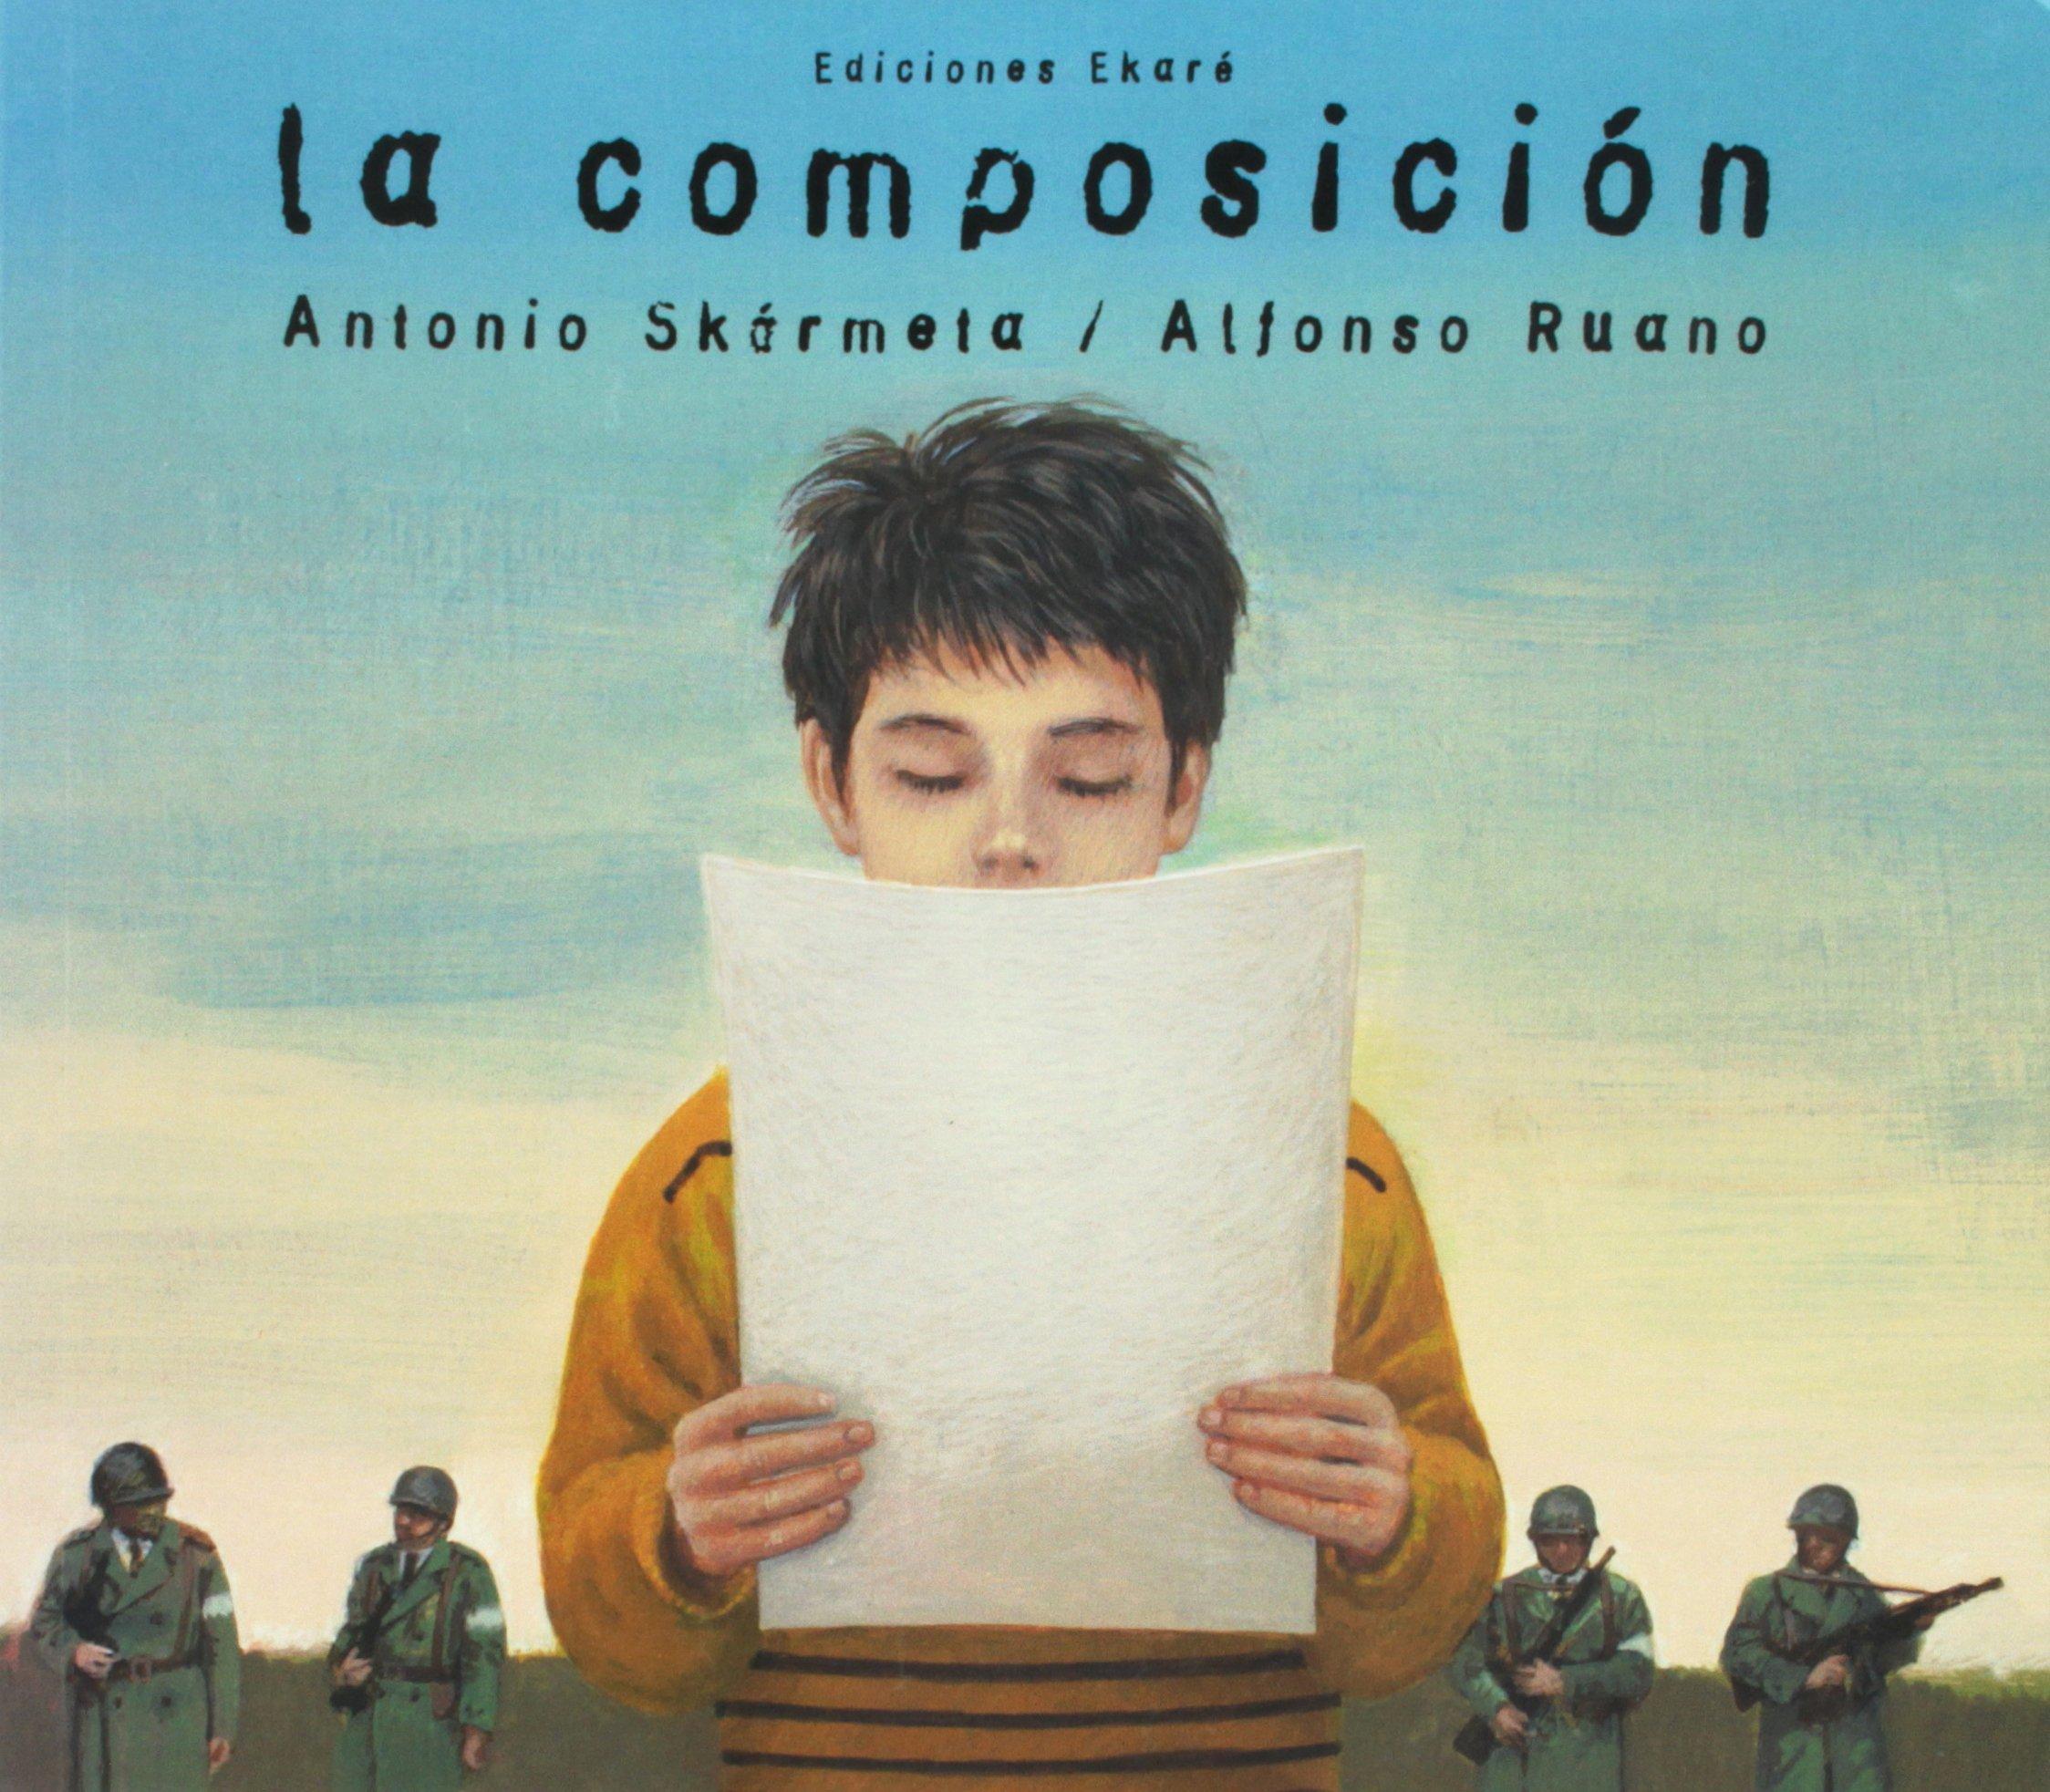 La Composicion/ The Composition (Spanish Edition) (Spanish) Paperback – October 30, 2004